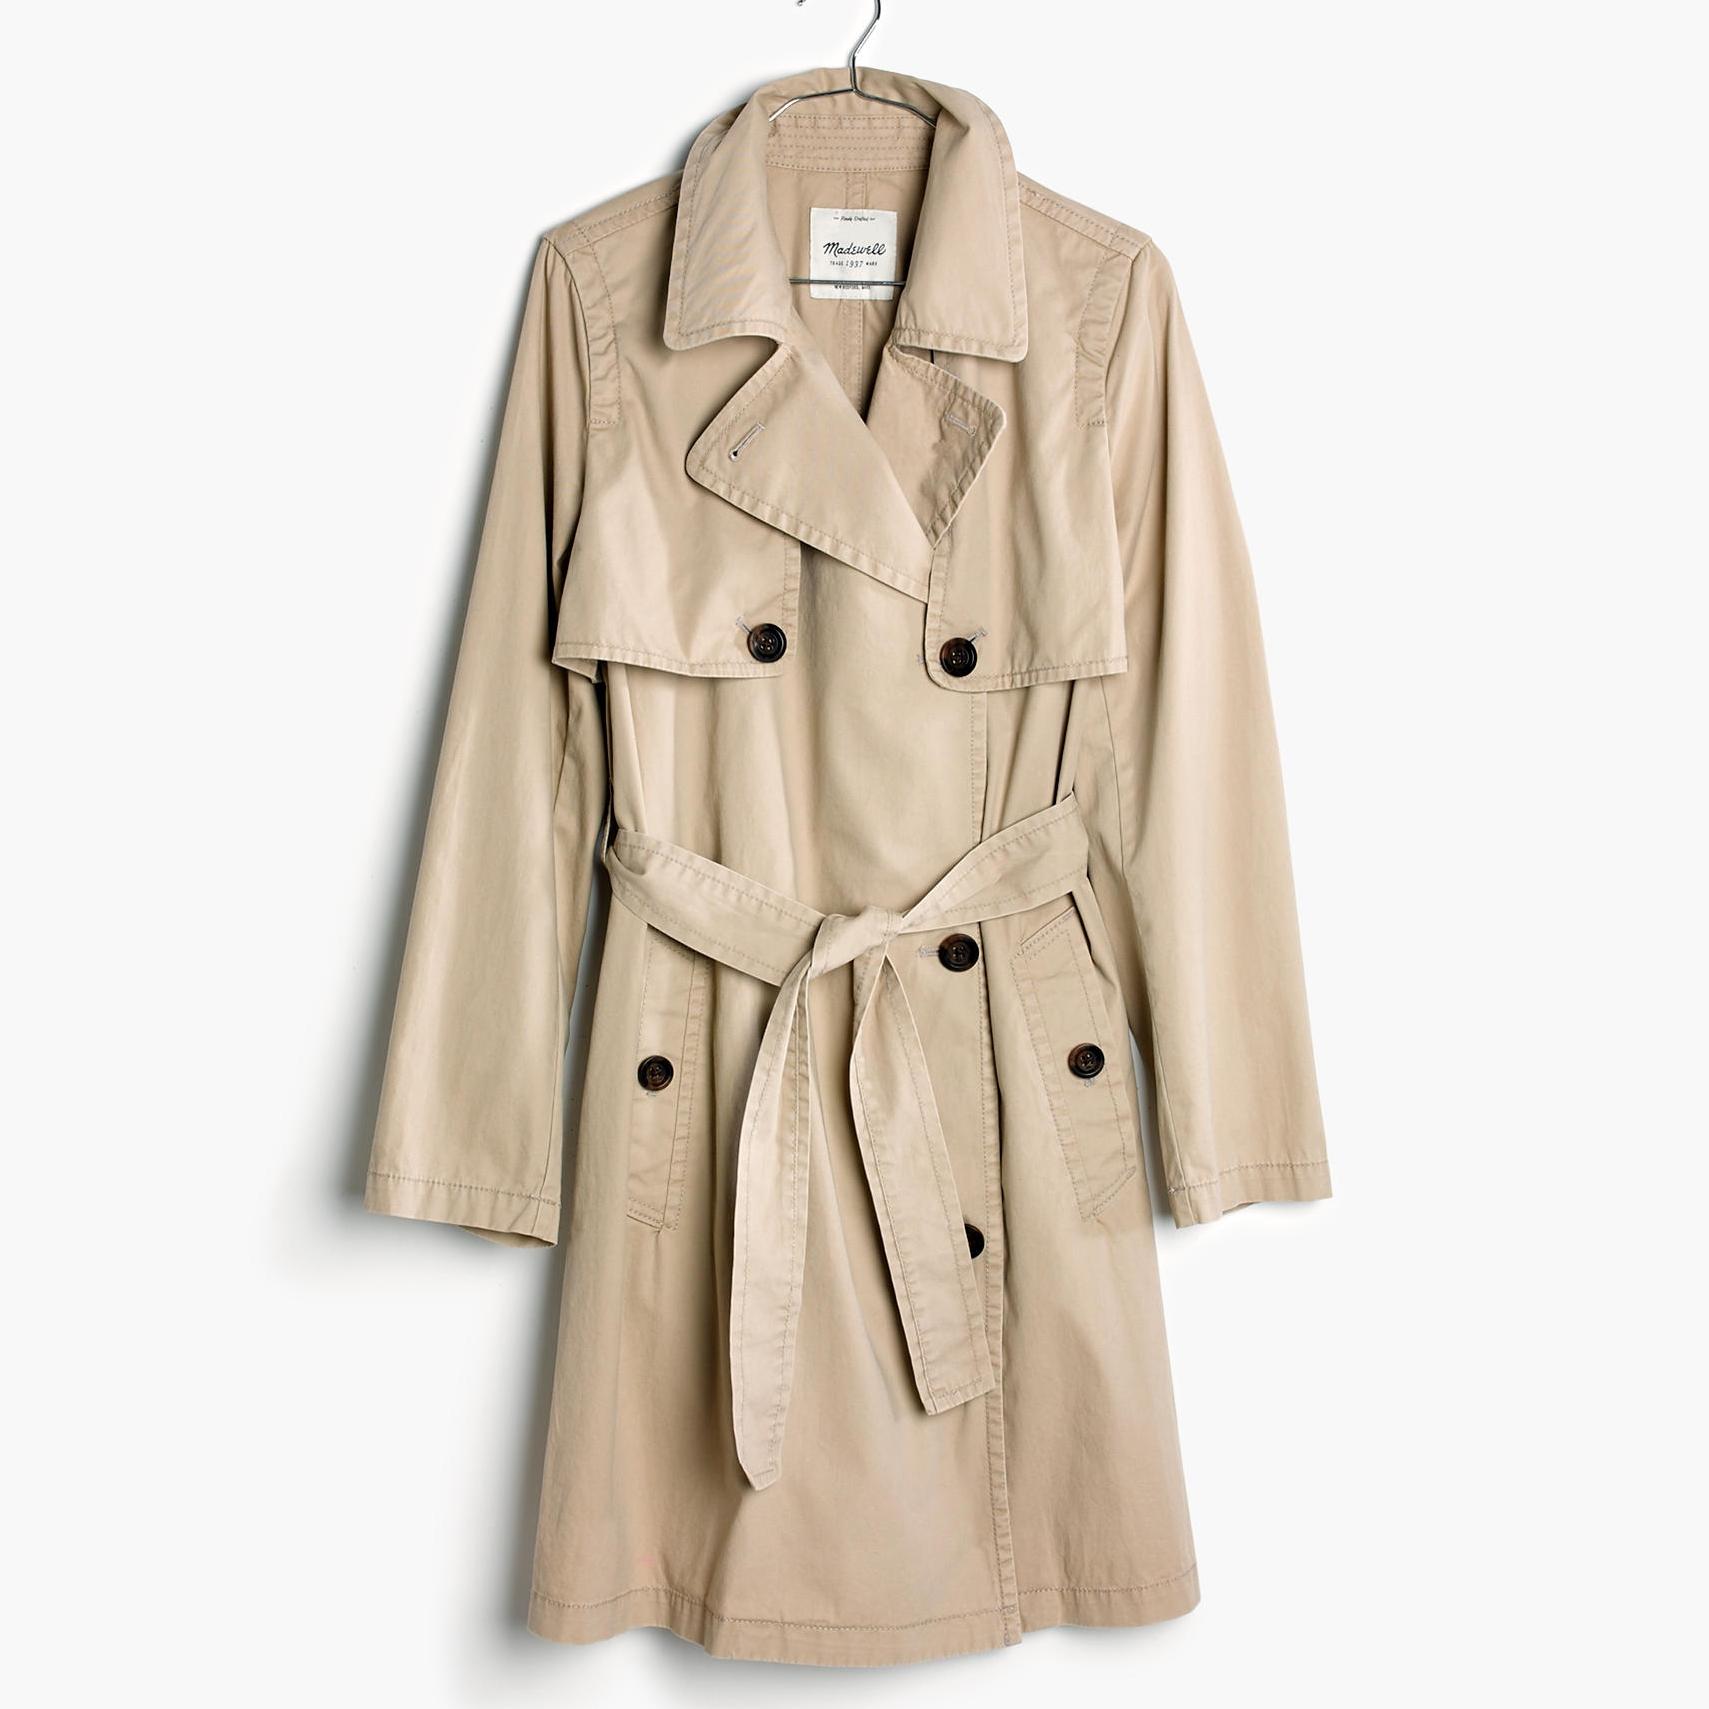 madewell tench coat.jpg